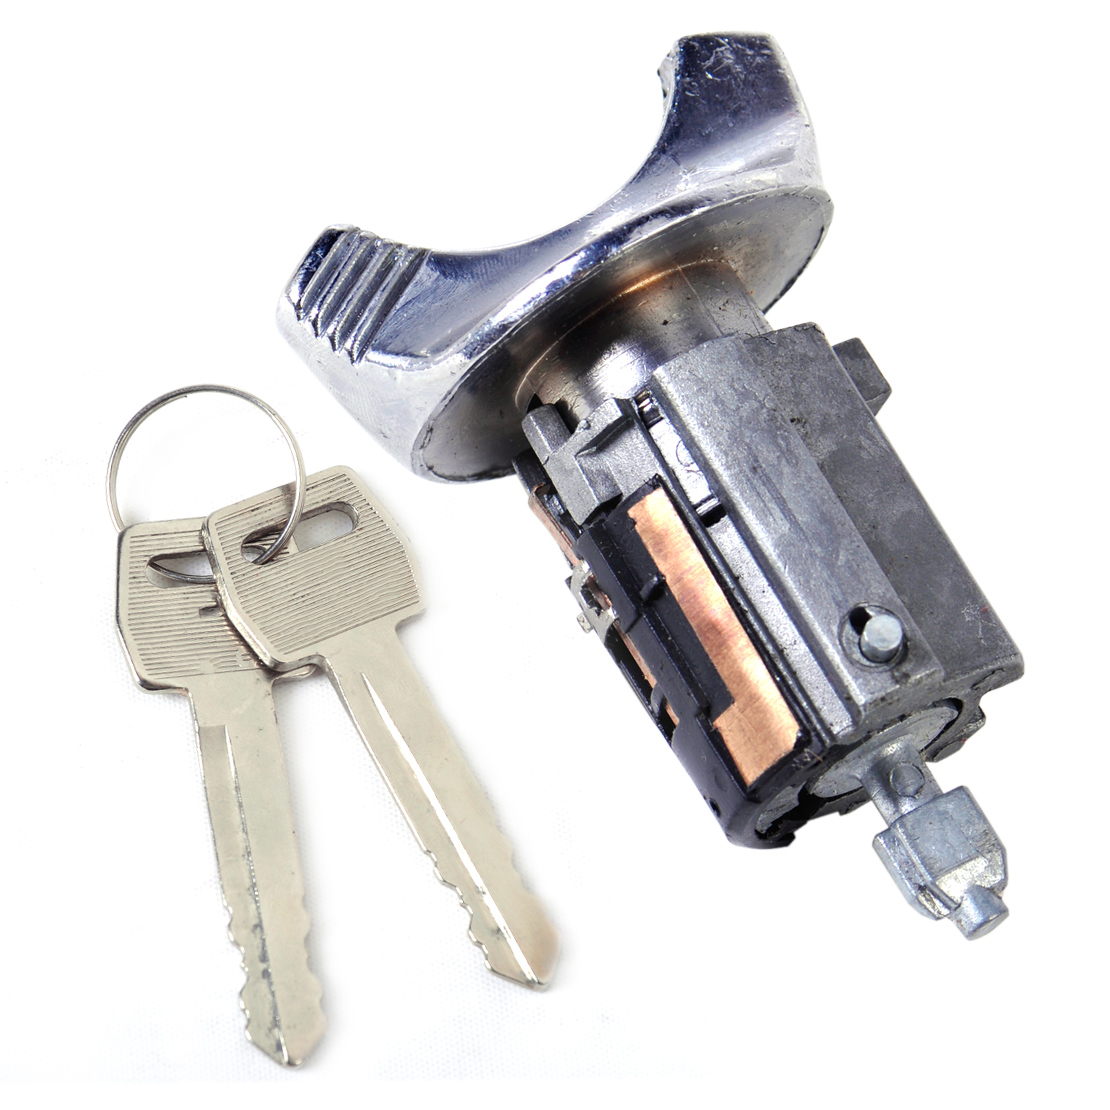 2001 Nissan Maxima Ignition Switch: CITALL F4TZ 1522050 B Ignition Key Switch Lock Cylinder